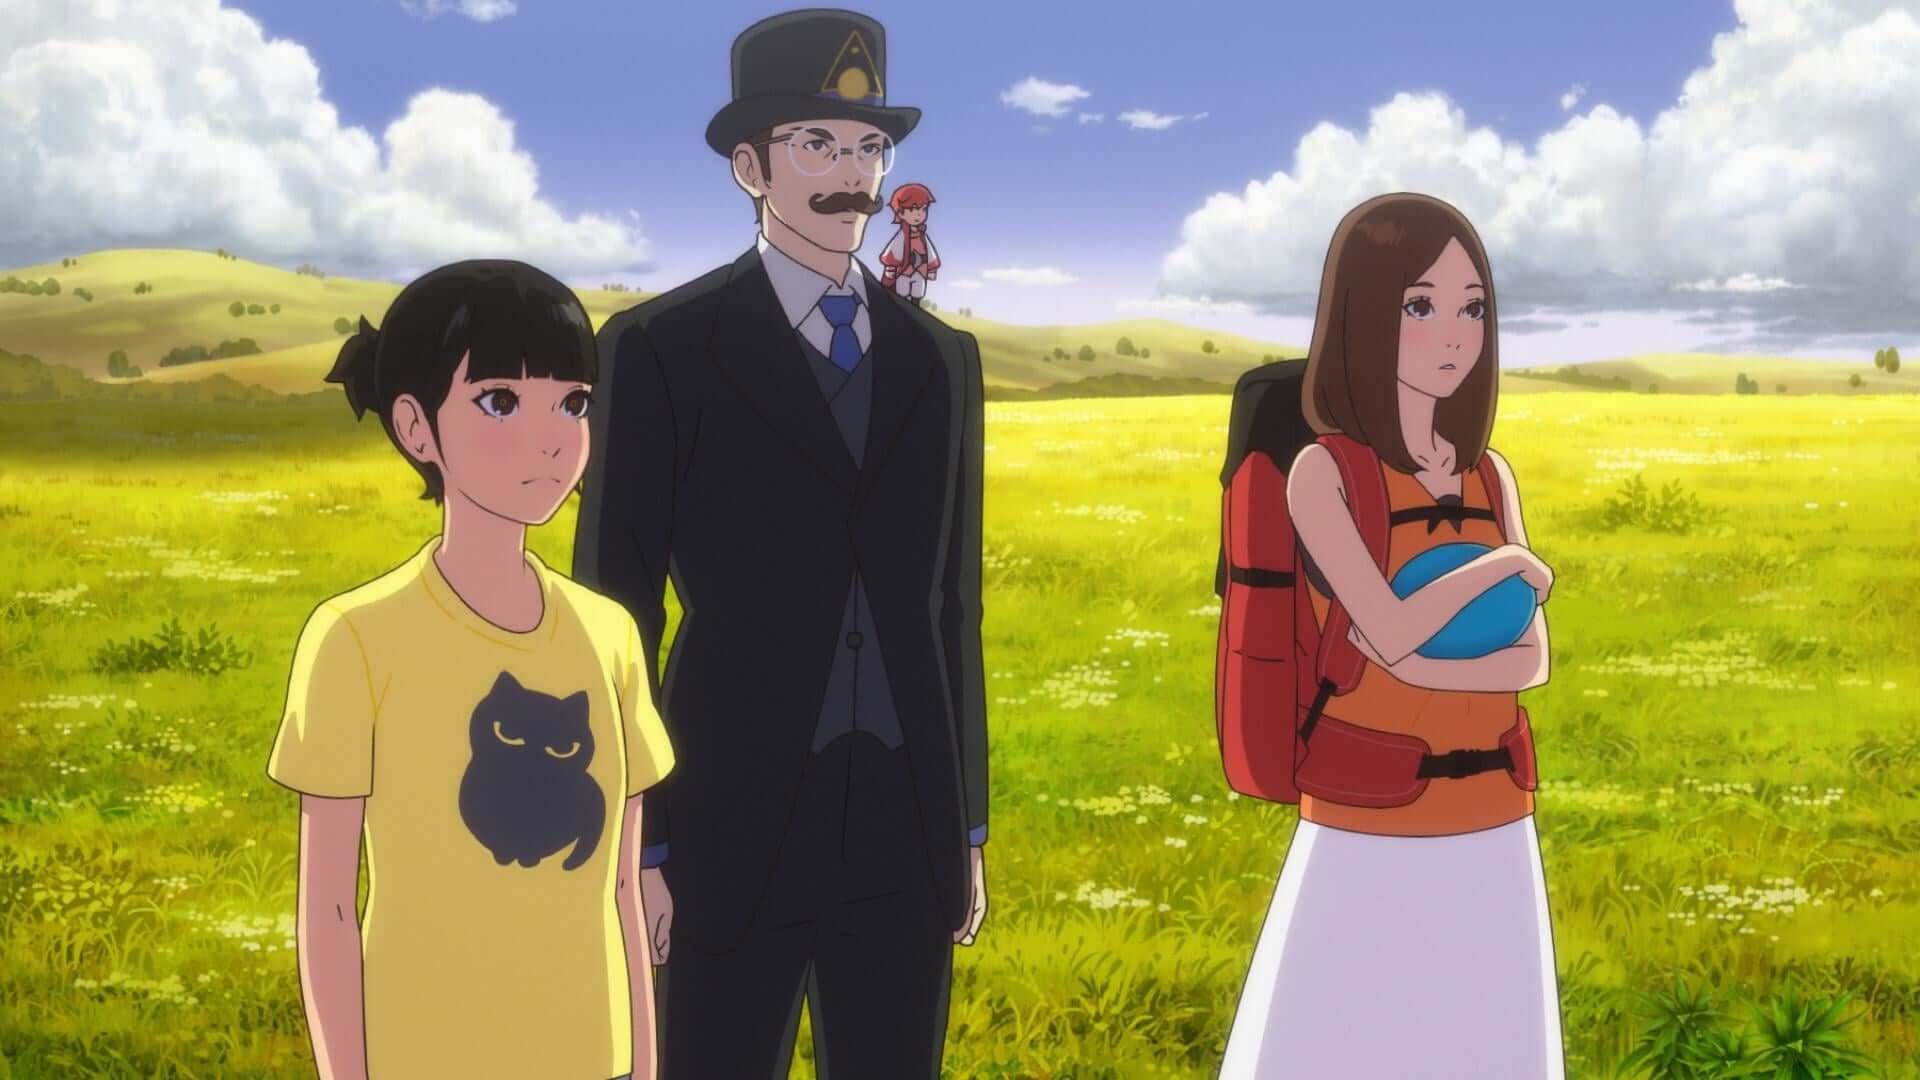 Netflixにアニメ『進撃の巨人』最終章や劇場版『銀魂』など続々追加!『トランスフォーマー』や『PSYCHO-PASS サイコパス』の最新作も art201127_netflix_6-1920x1080